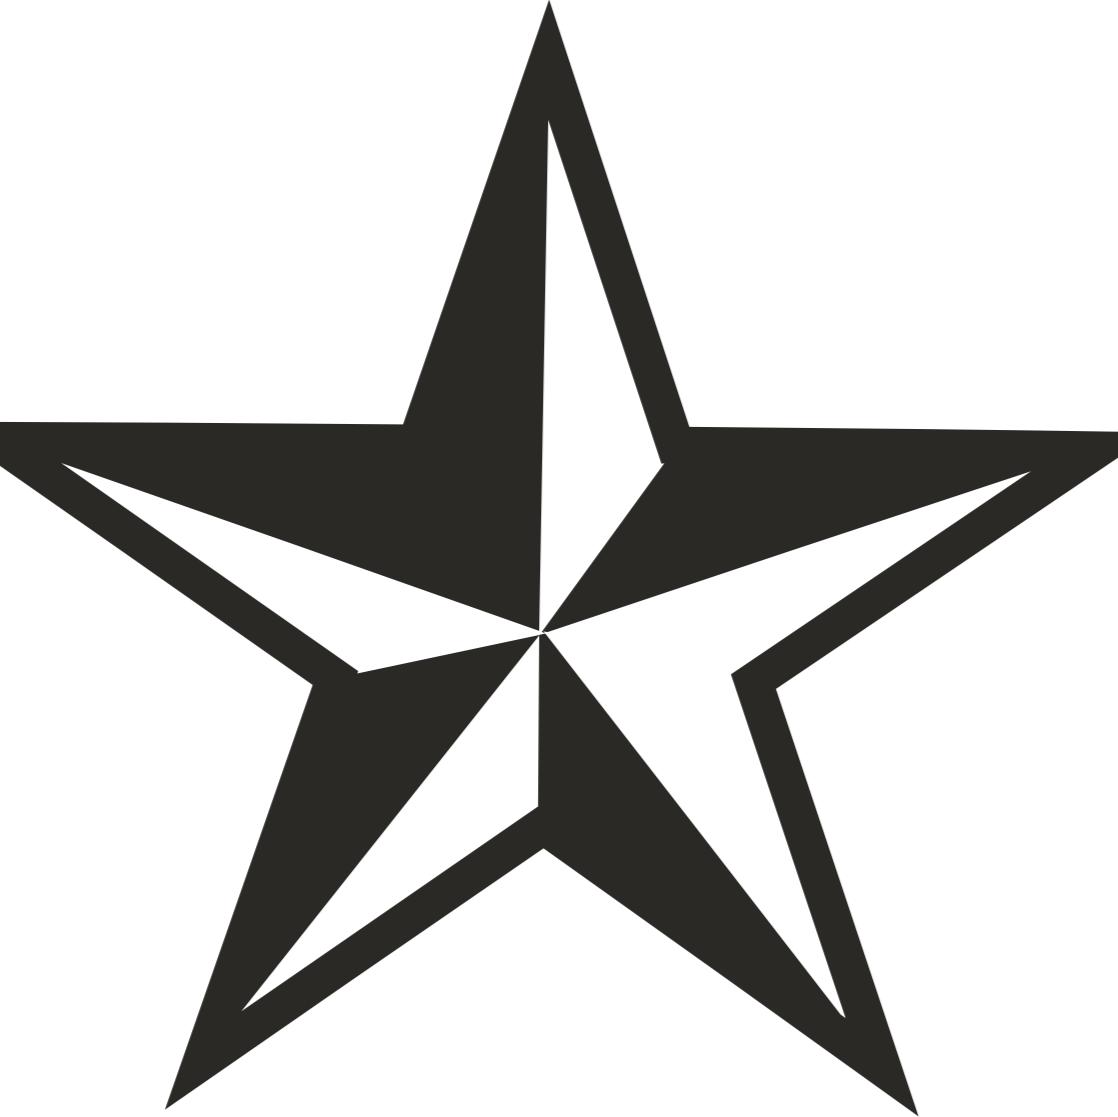 1118x1117 Texas Clip Art Clipart Image 1